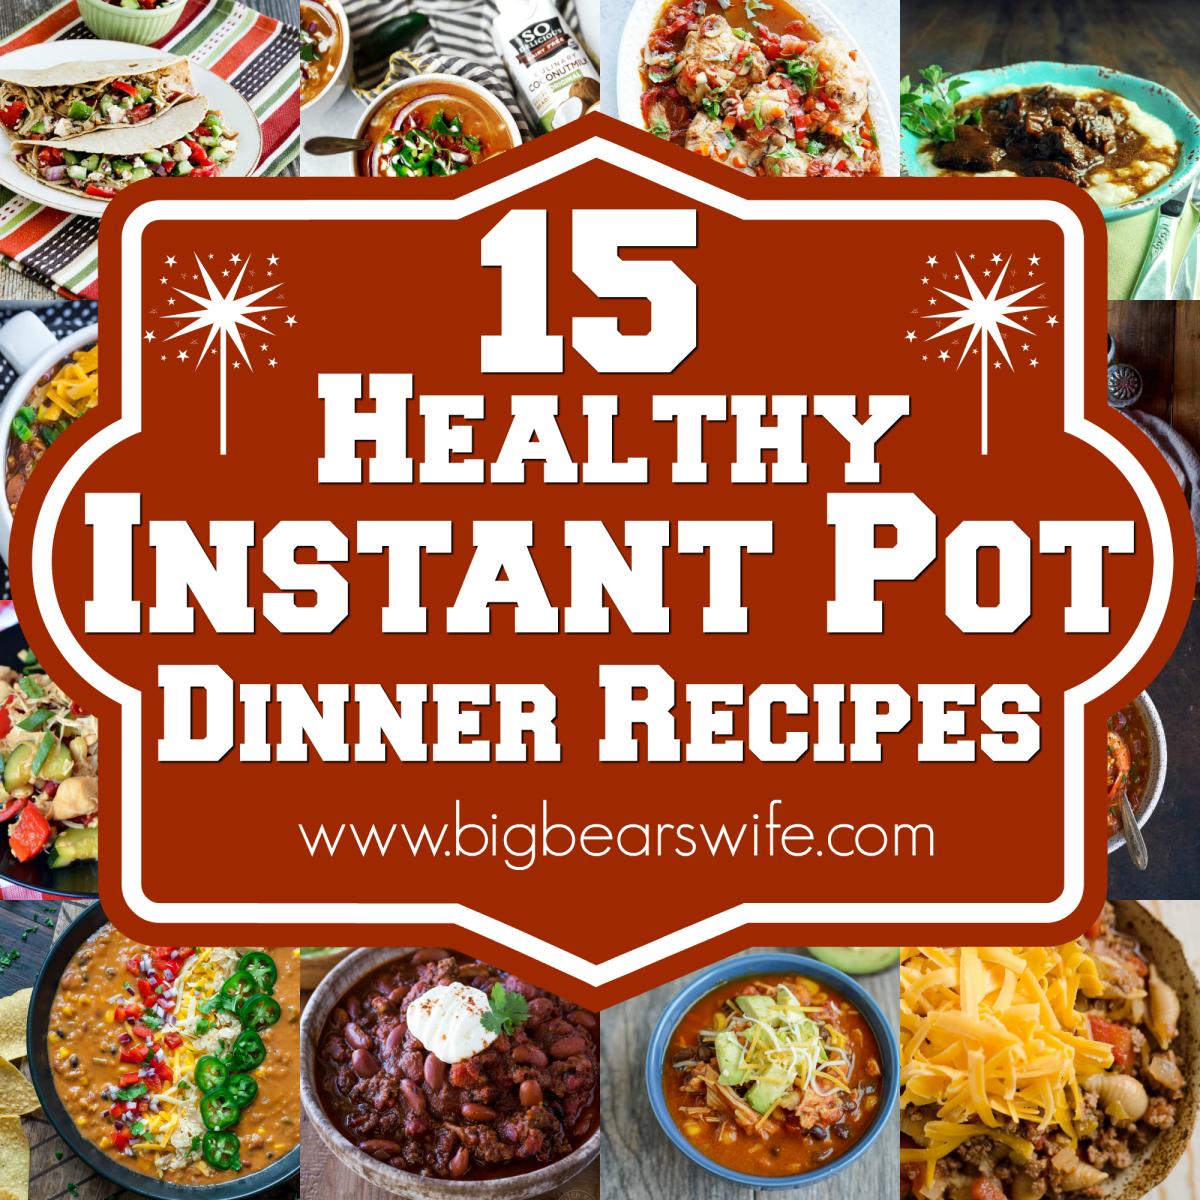 15 Healthy Instant Pot Dinner Recipes